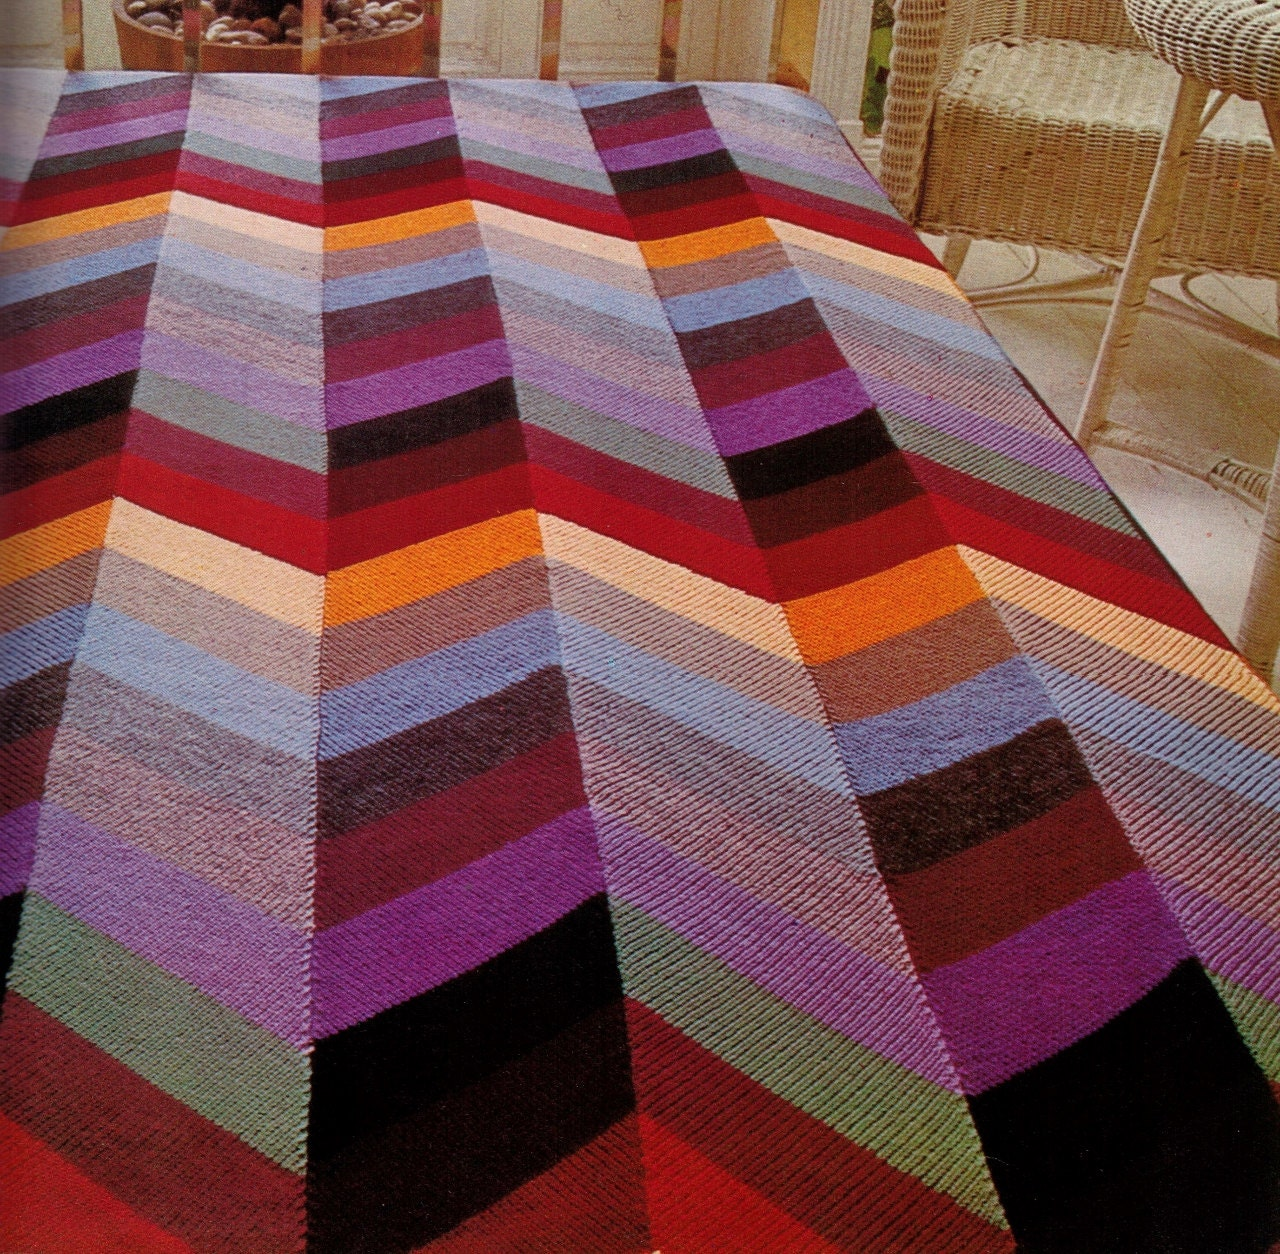 Knitting Zig Zag Blanket Pattern : Vintage s d zig zag pattern bedspread blanket knitted